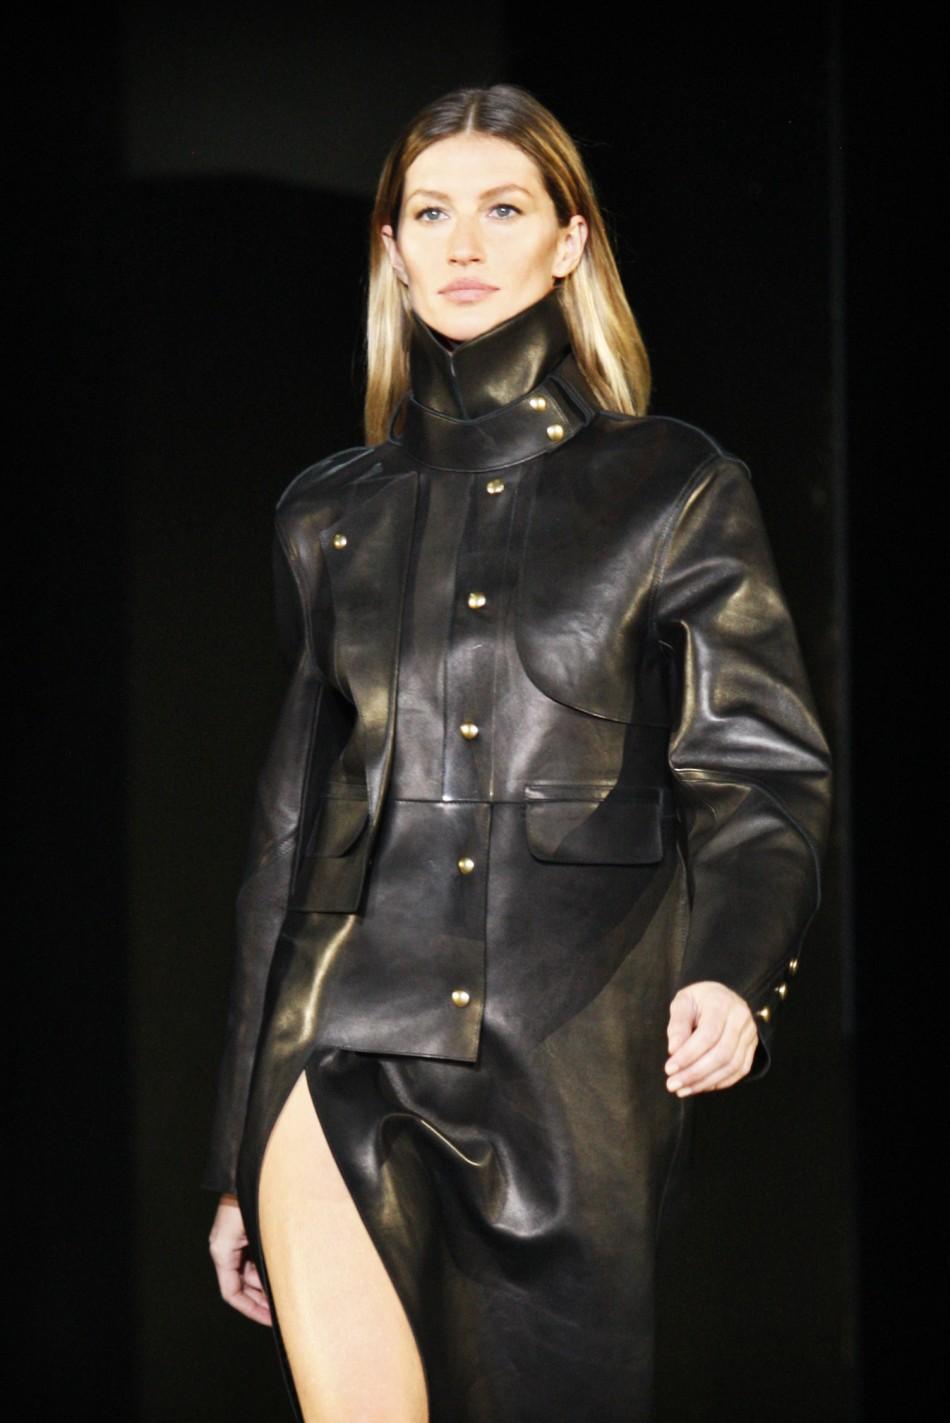 New York Fashion Week 2012 - Alexander Wang